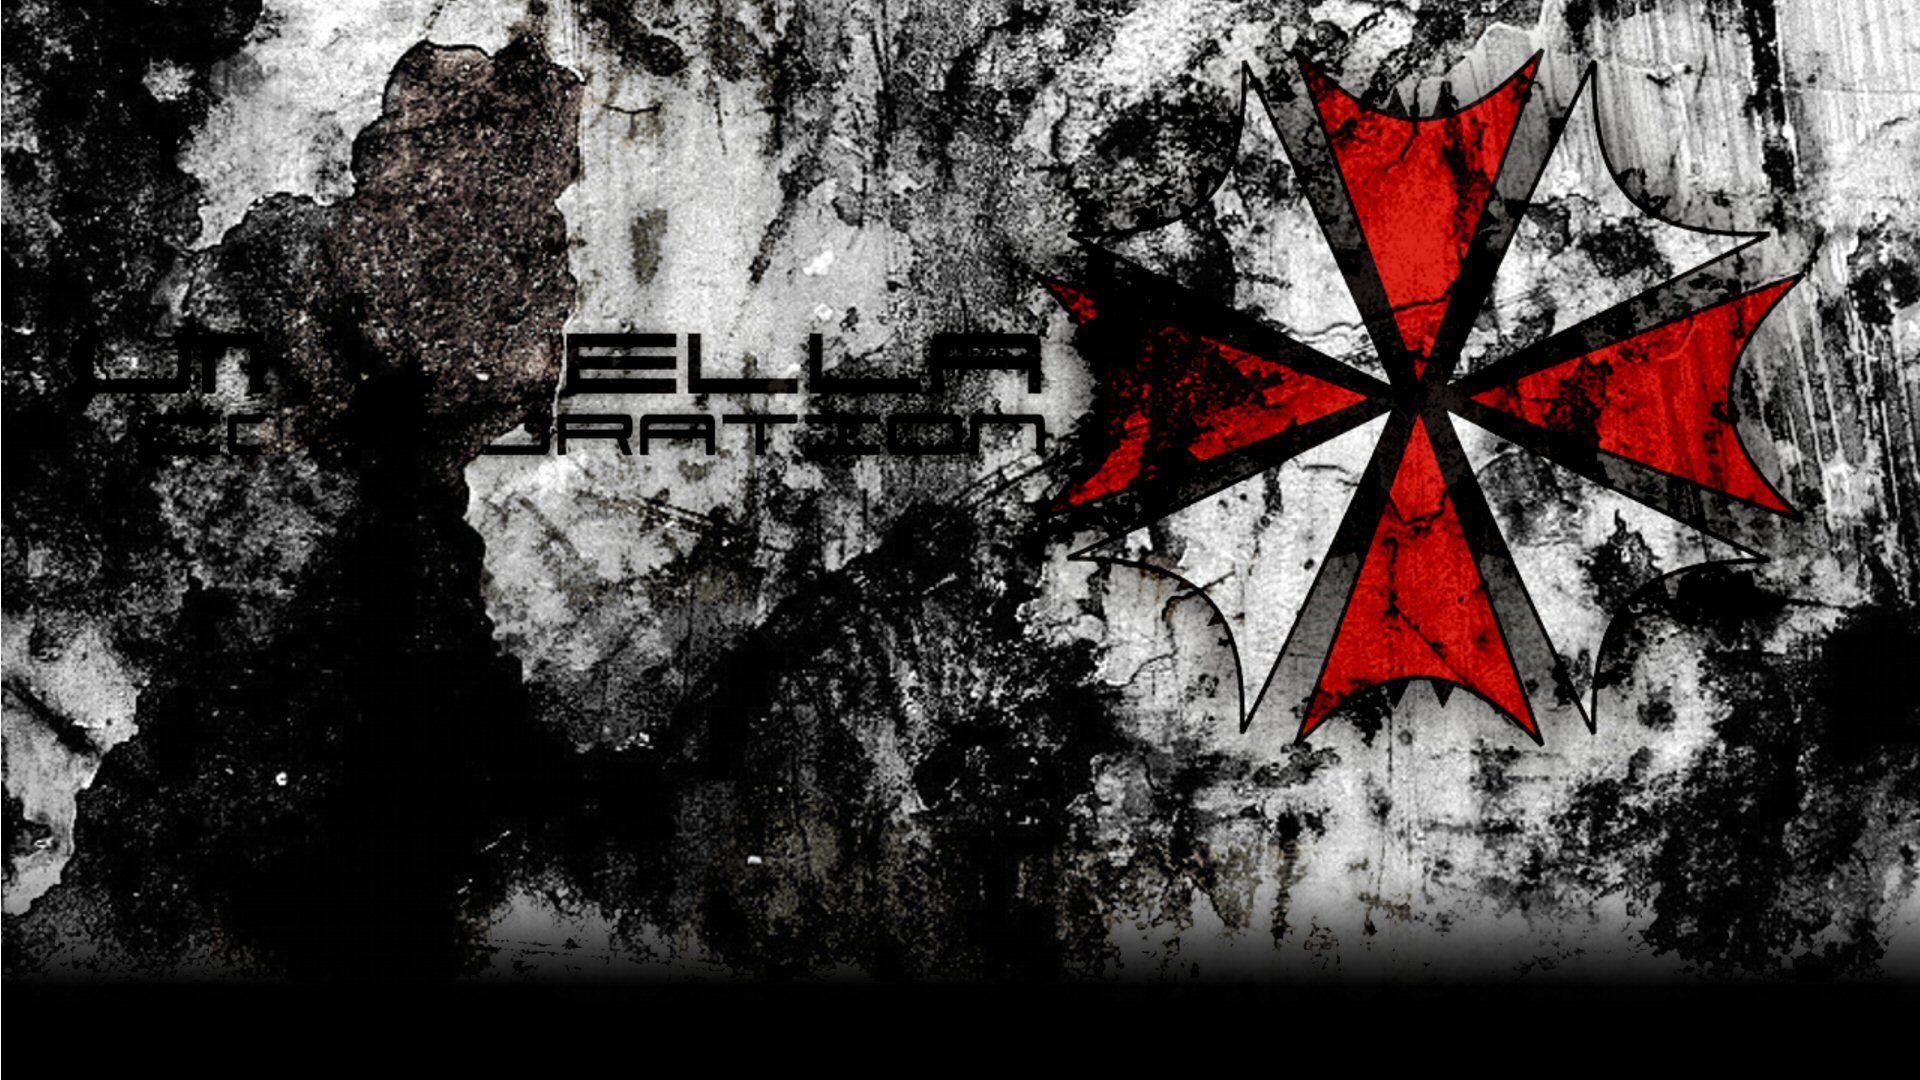 297 Resident Evil Hd Wallpapers Backgrounds Wallpaper